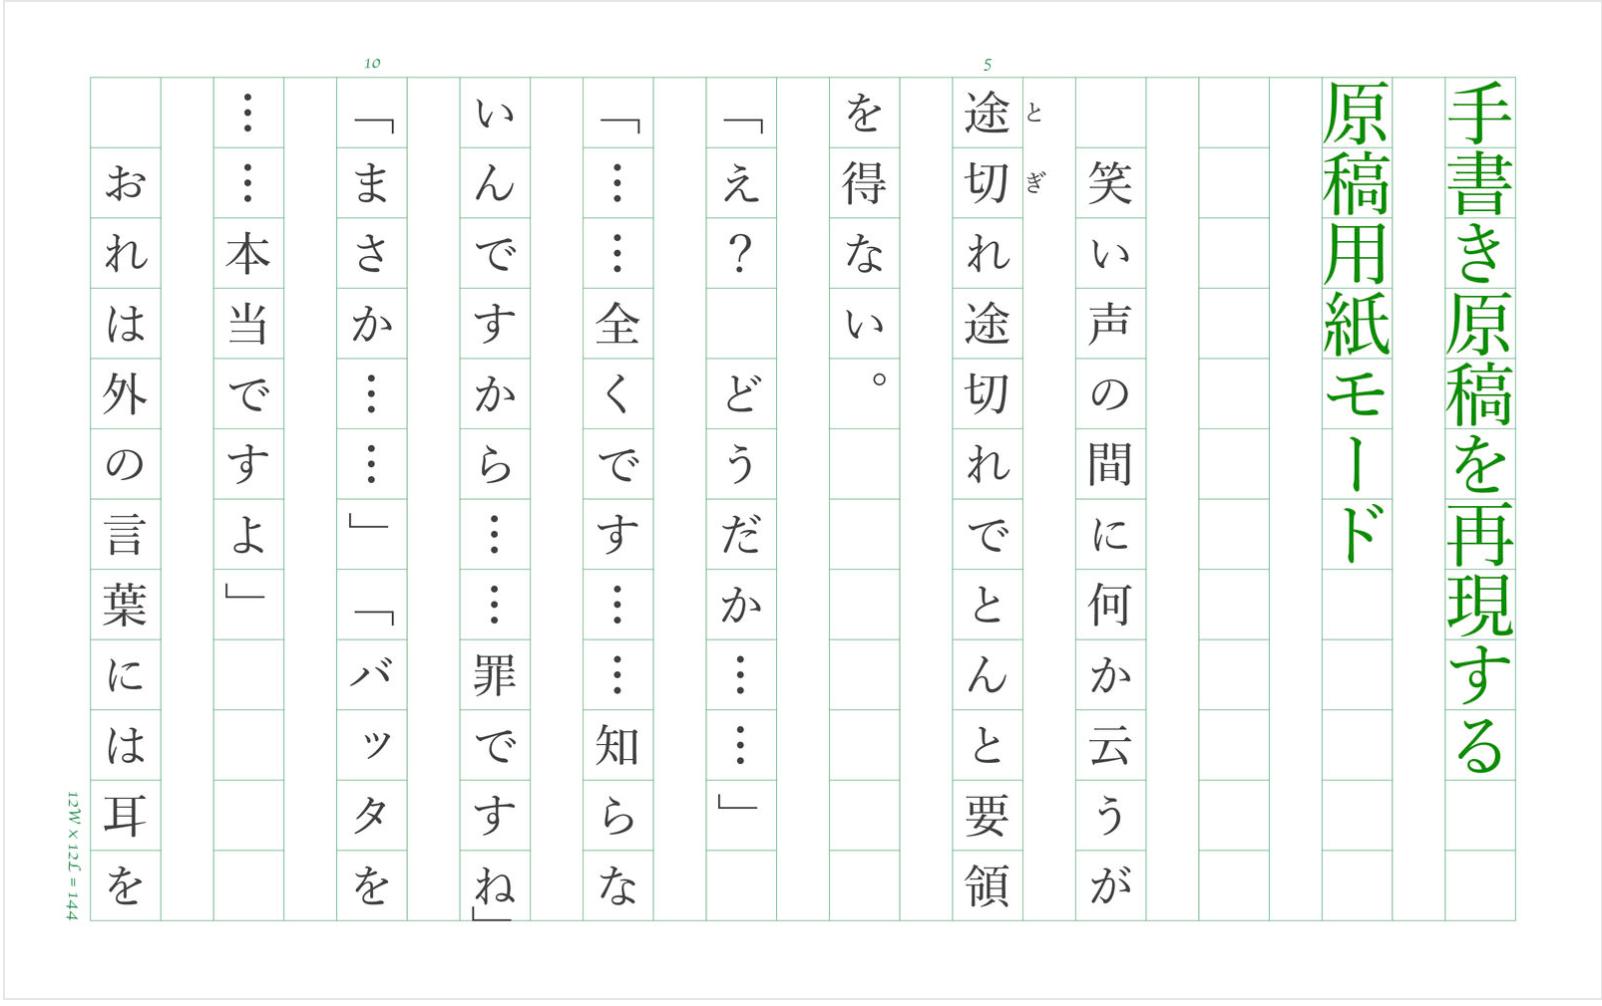 egword Universal traditional Japanese typography